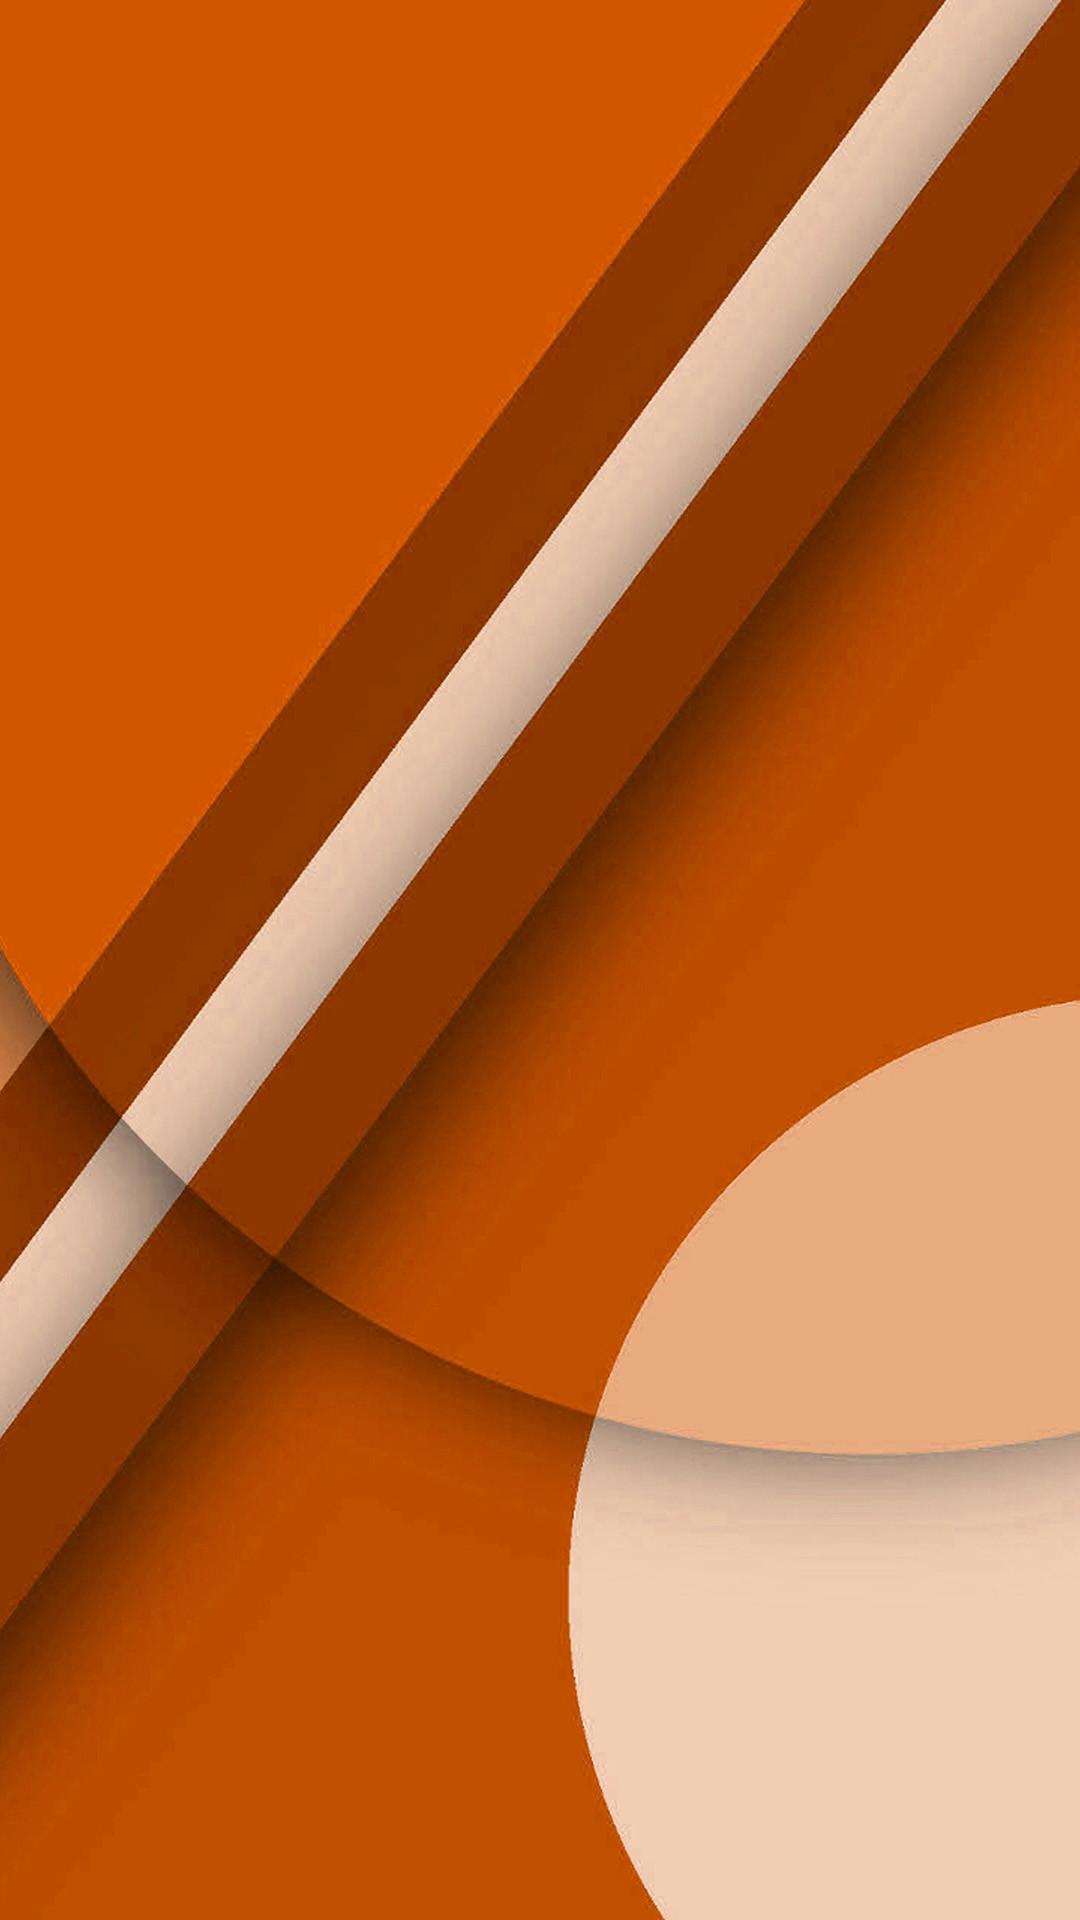 orange geometric iphone 6 plus wallpaper | iPhone 6 Plus Wallpapers HD .